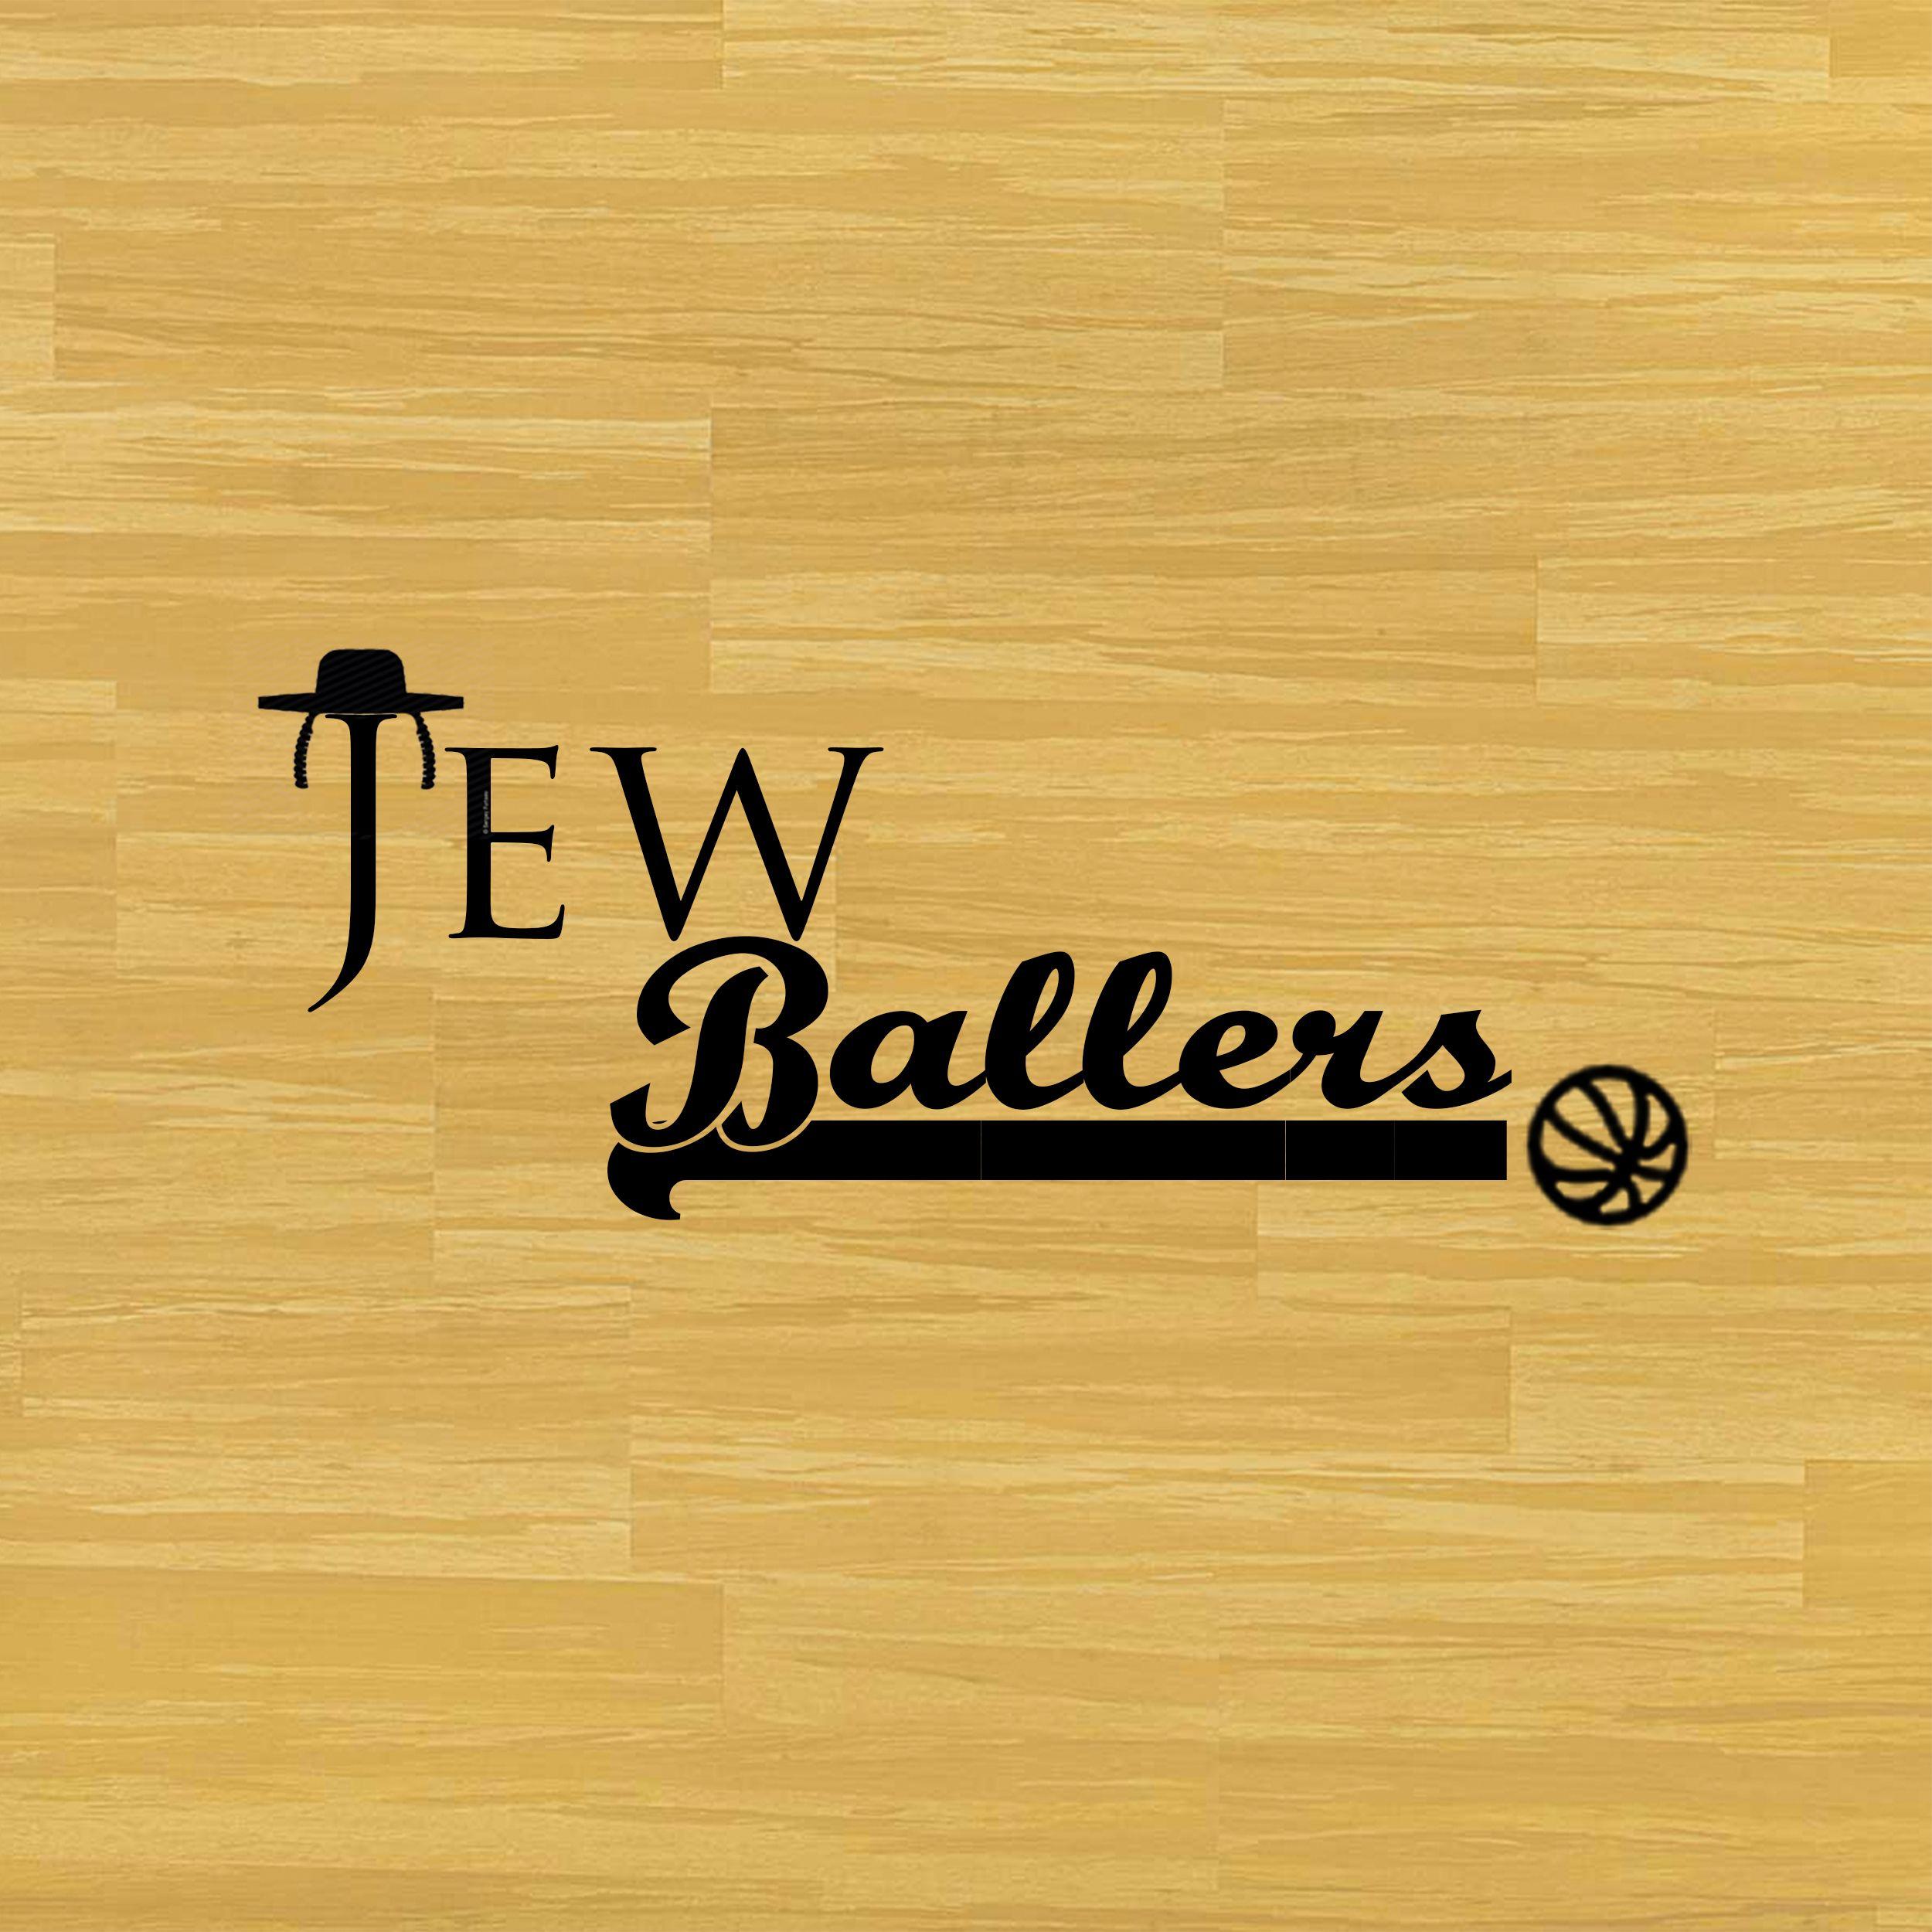 Jew-Ballers